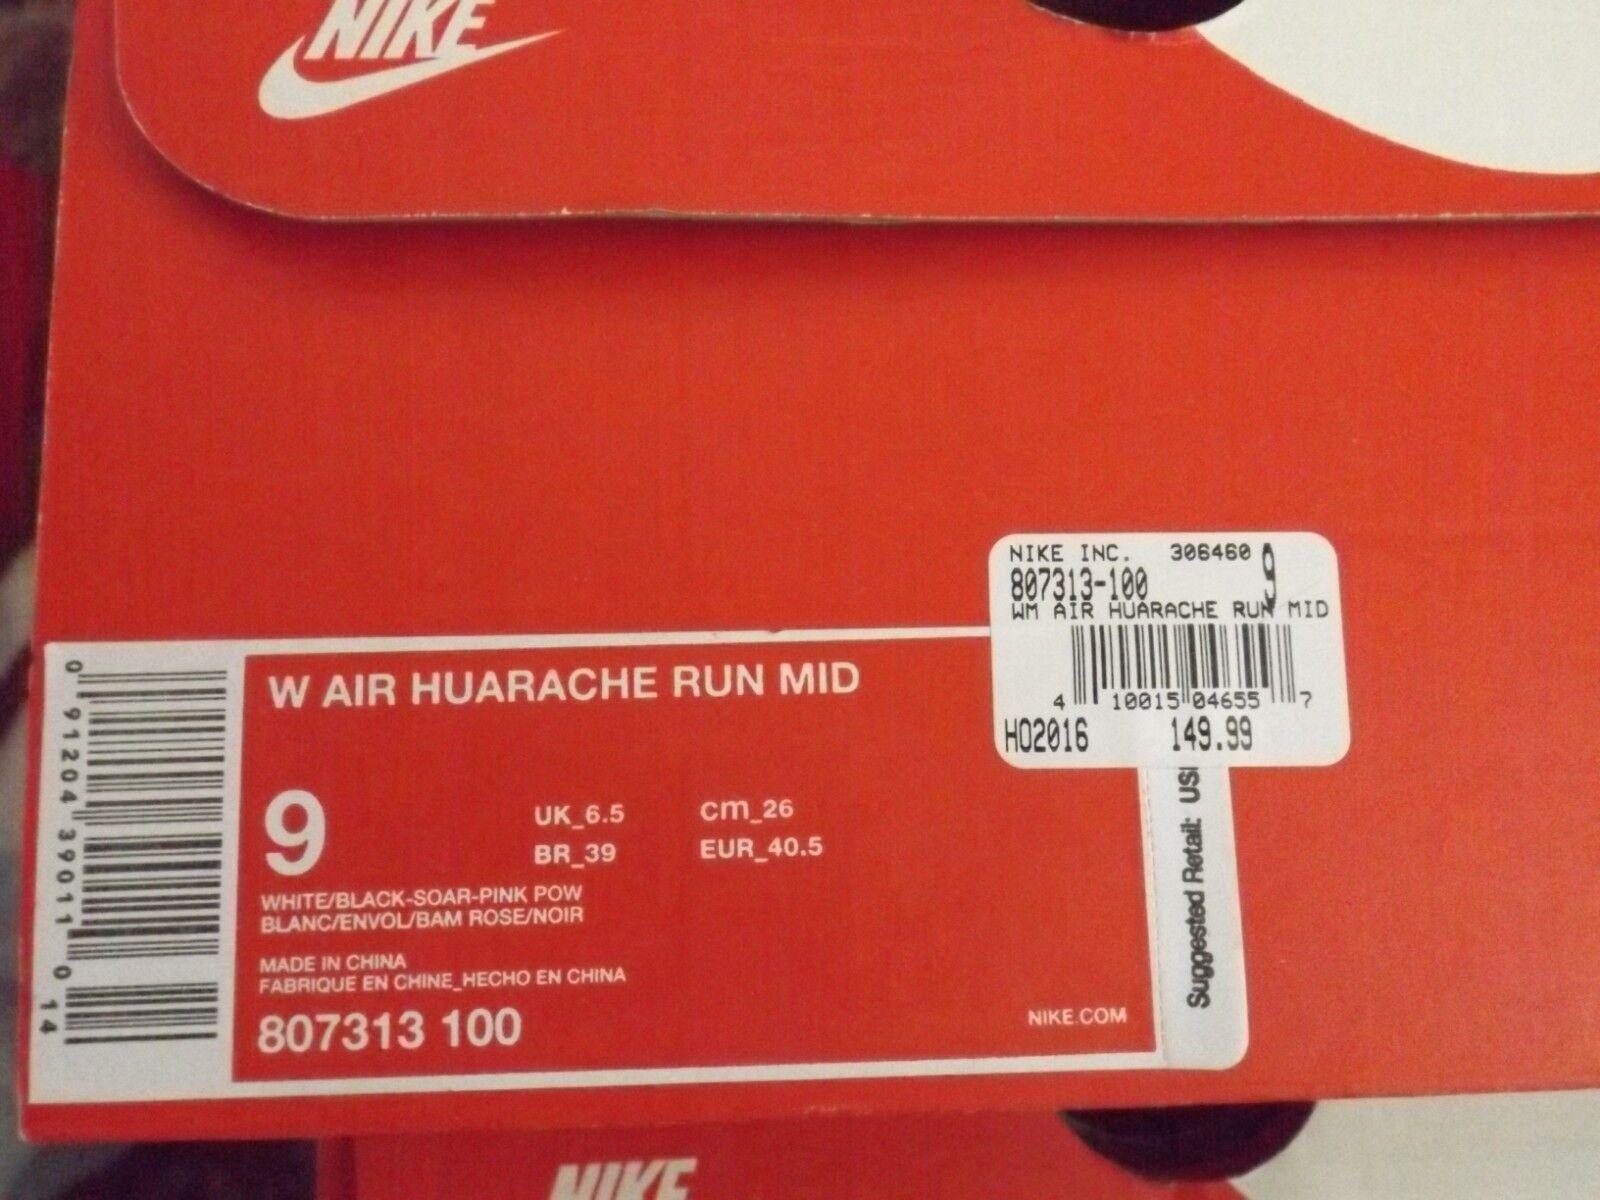 Nike scatola air jordan 8 retrò kobe 8 302370-121 nessuna scatola Nike c42dc5